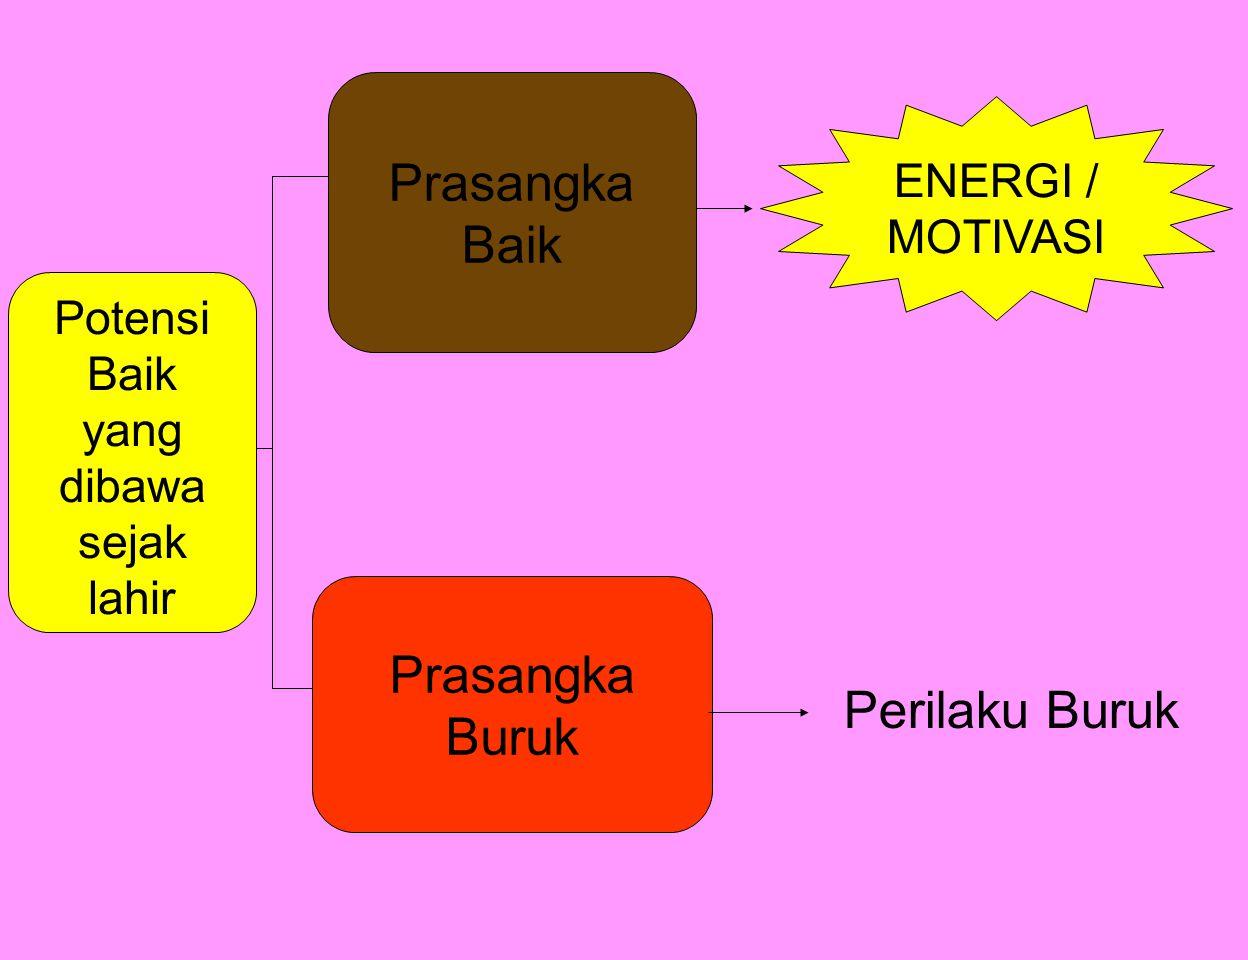 Potensi Baik yang dibawa sejak lahir Prasangka Buruk Prasangka Baik ENERGI / MOTIVASI Perilaku Buruk